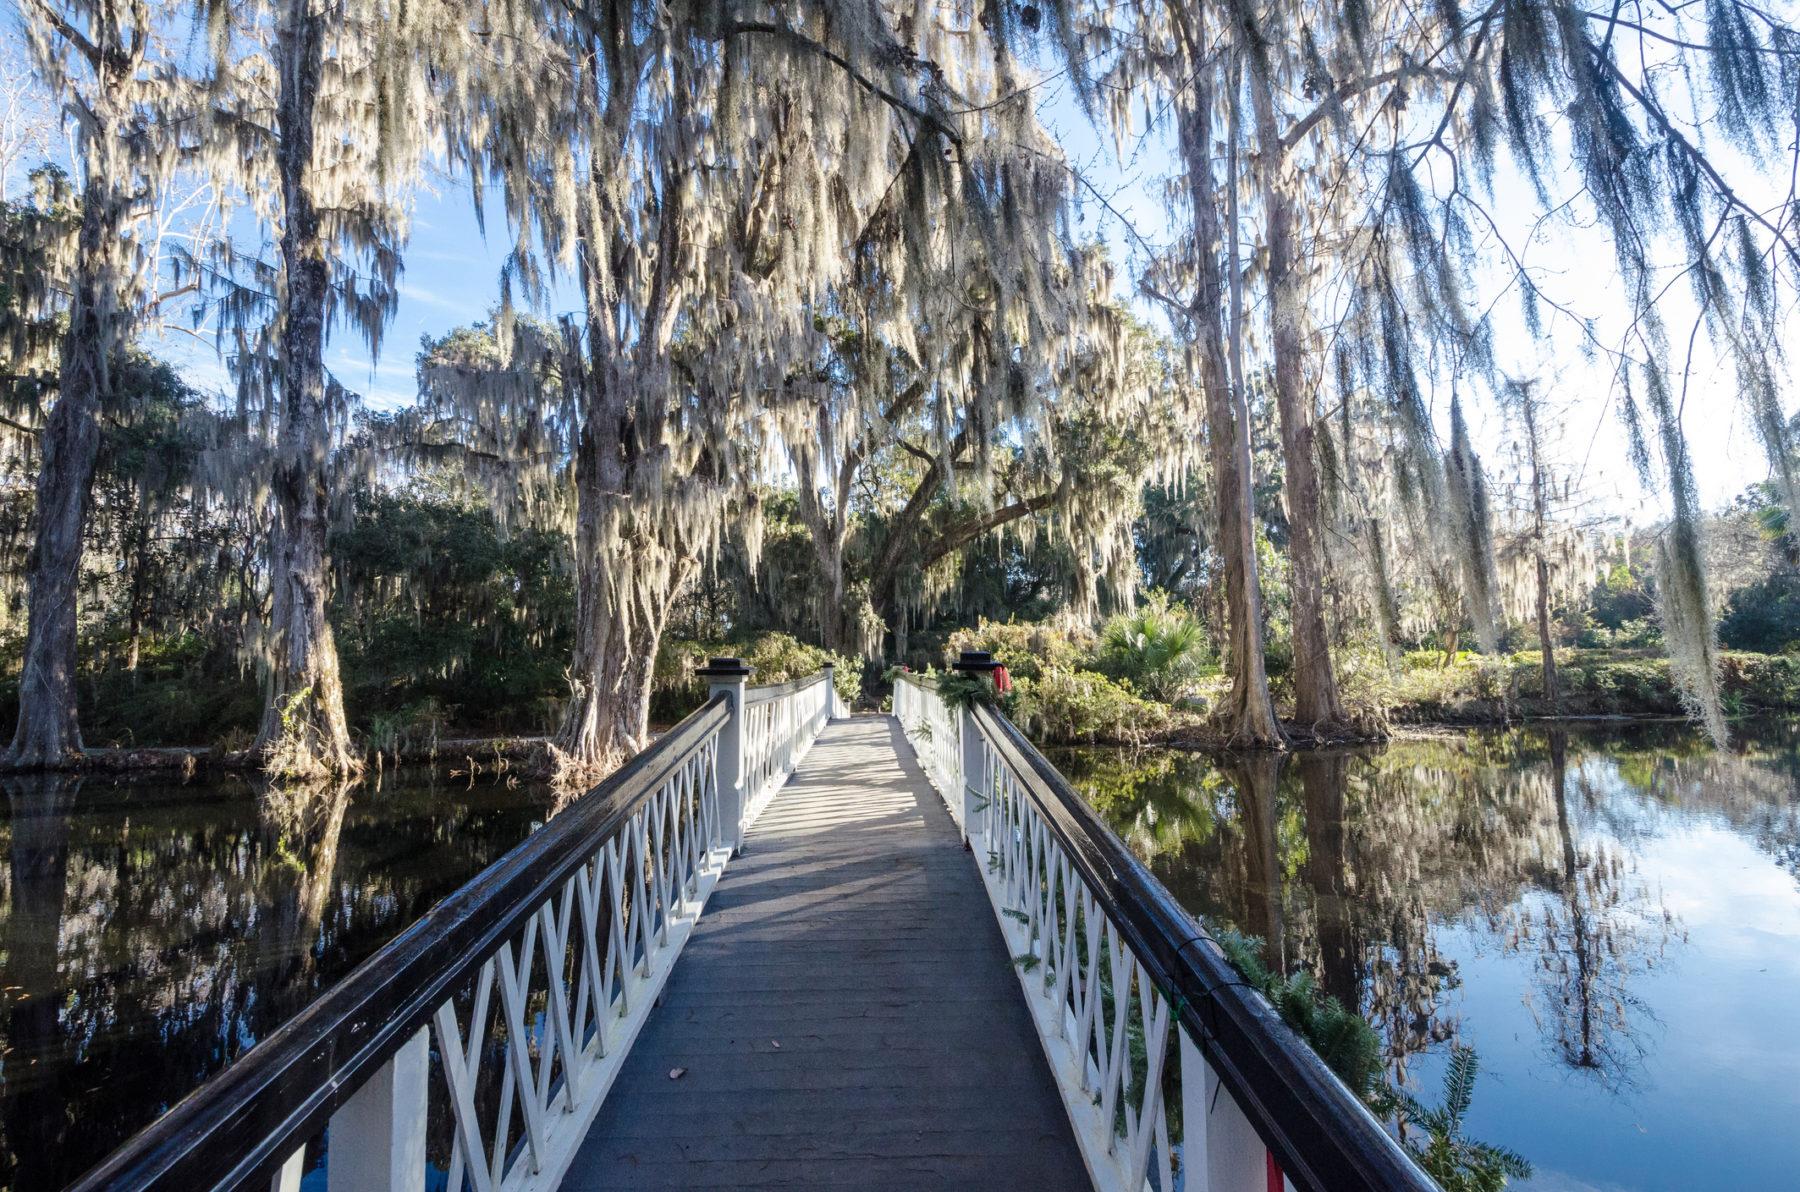 FITSNews – Amy Feinstein: Plantation Wedding Boycott Could Harm South Carolina's Economy